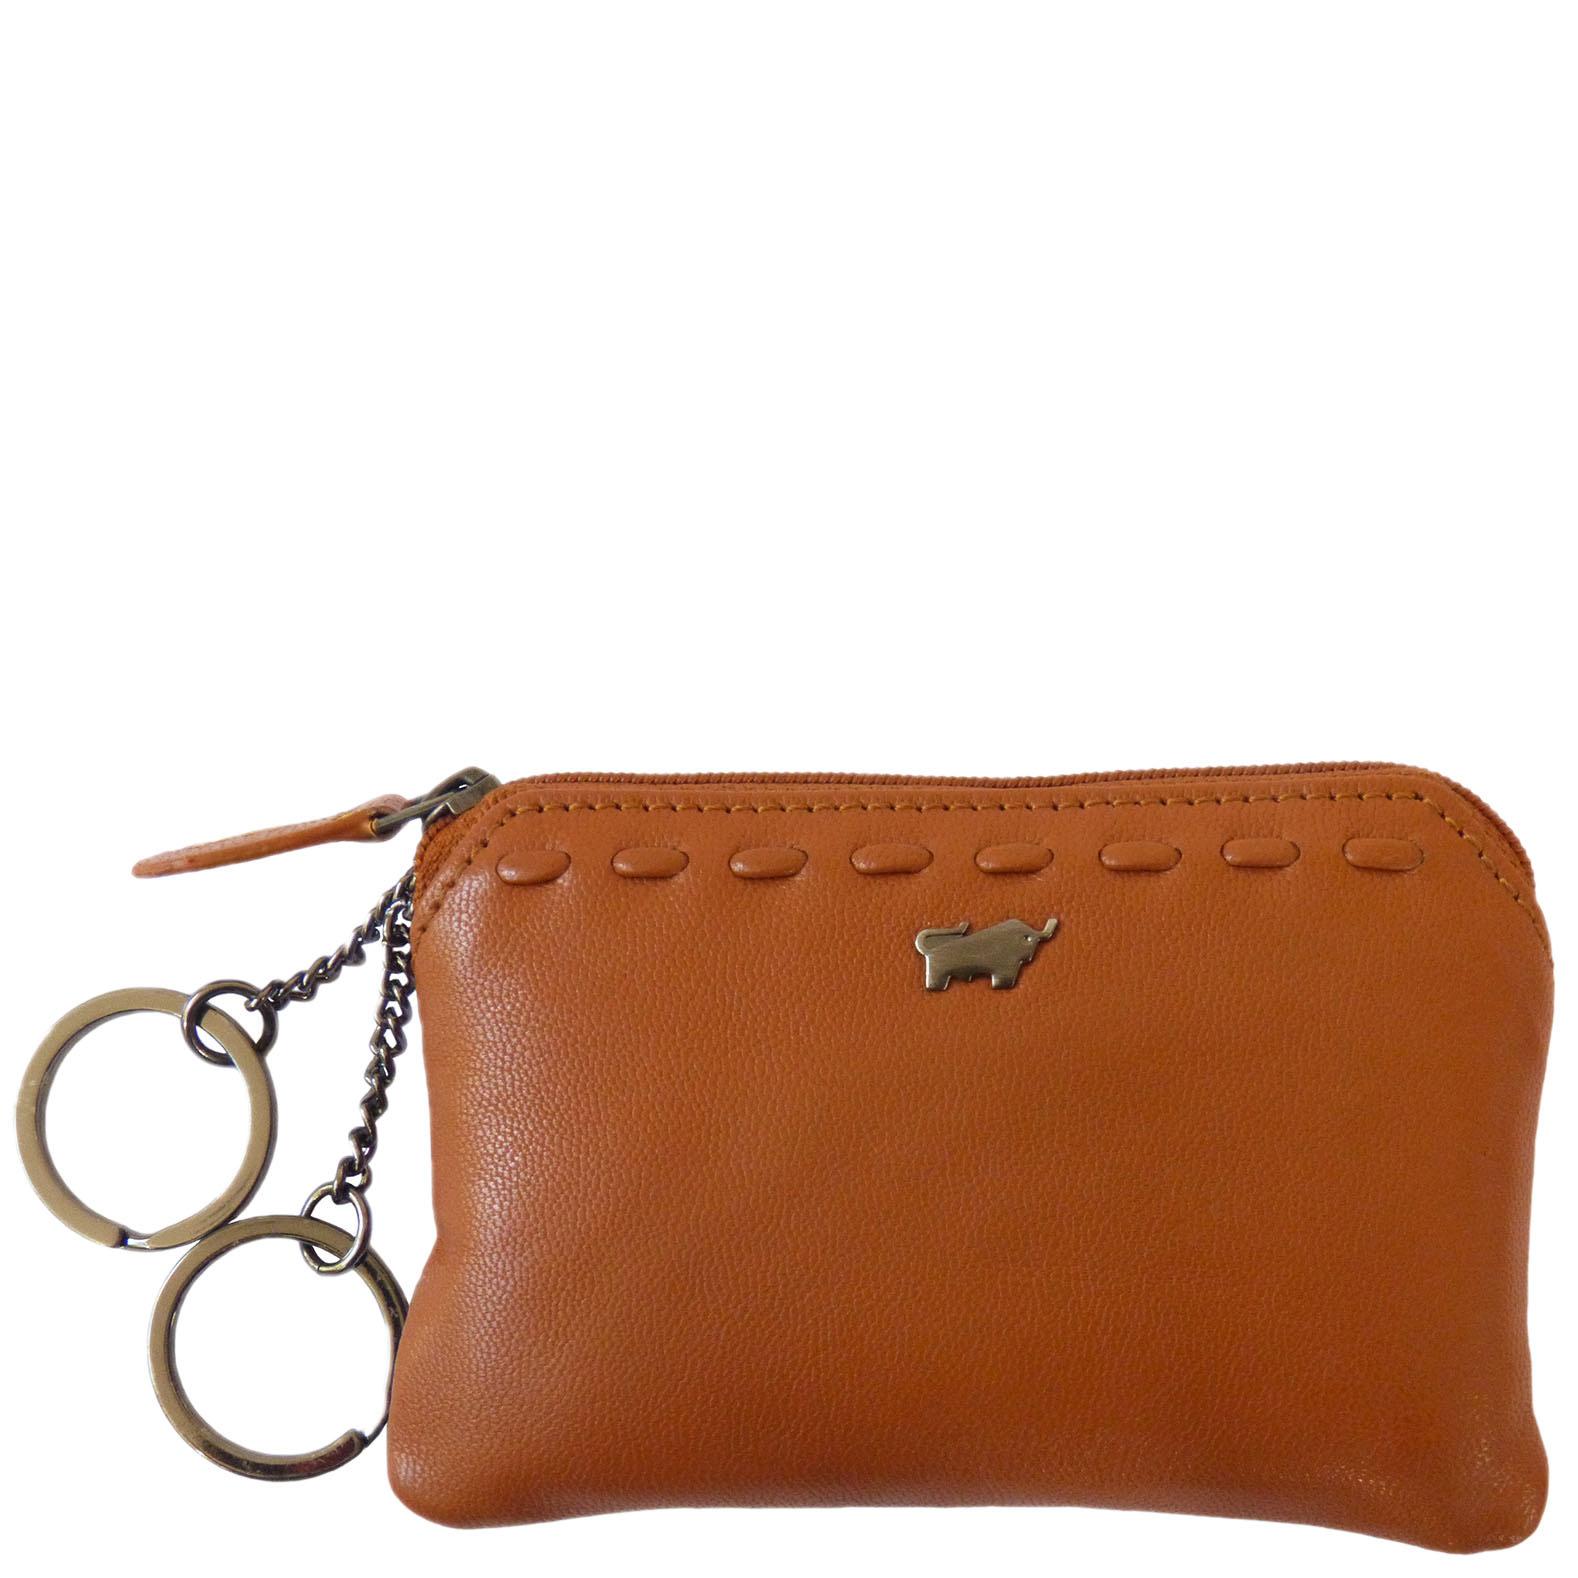 Ключница Braun Bueffel Soave светло-коричневого цвета